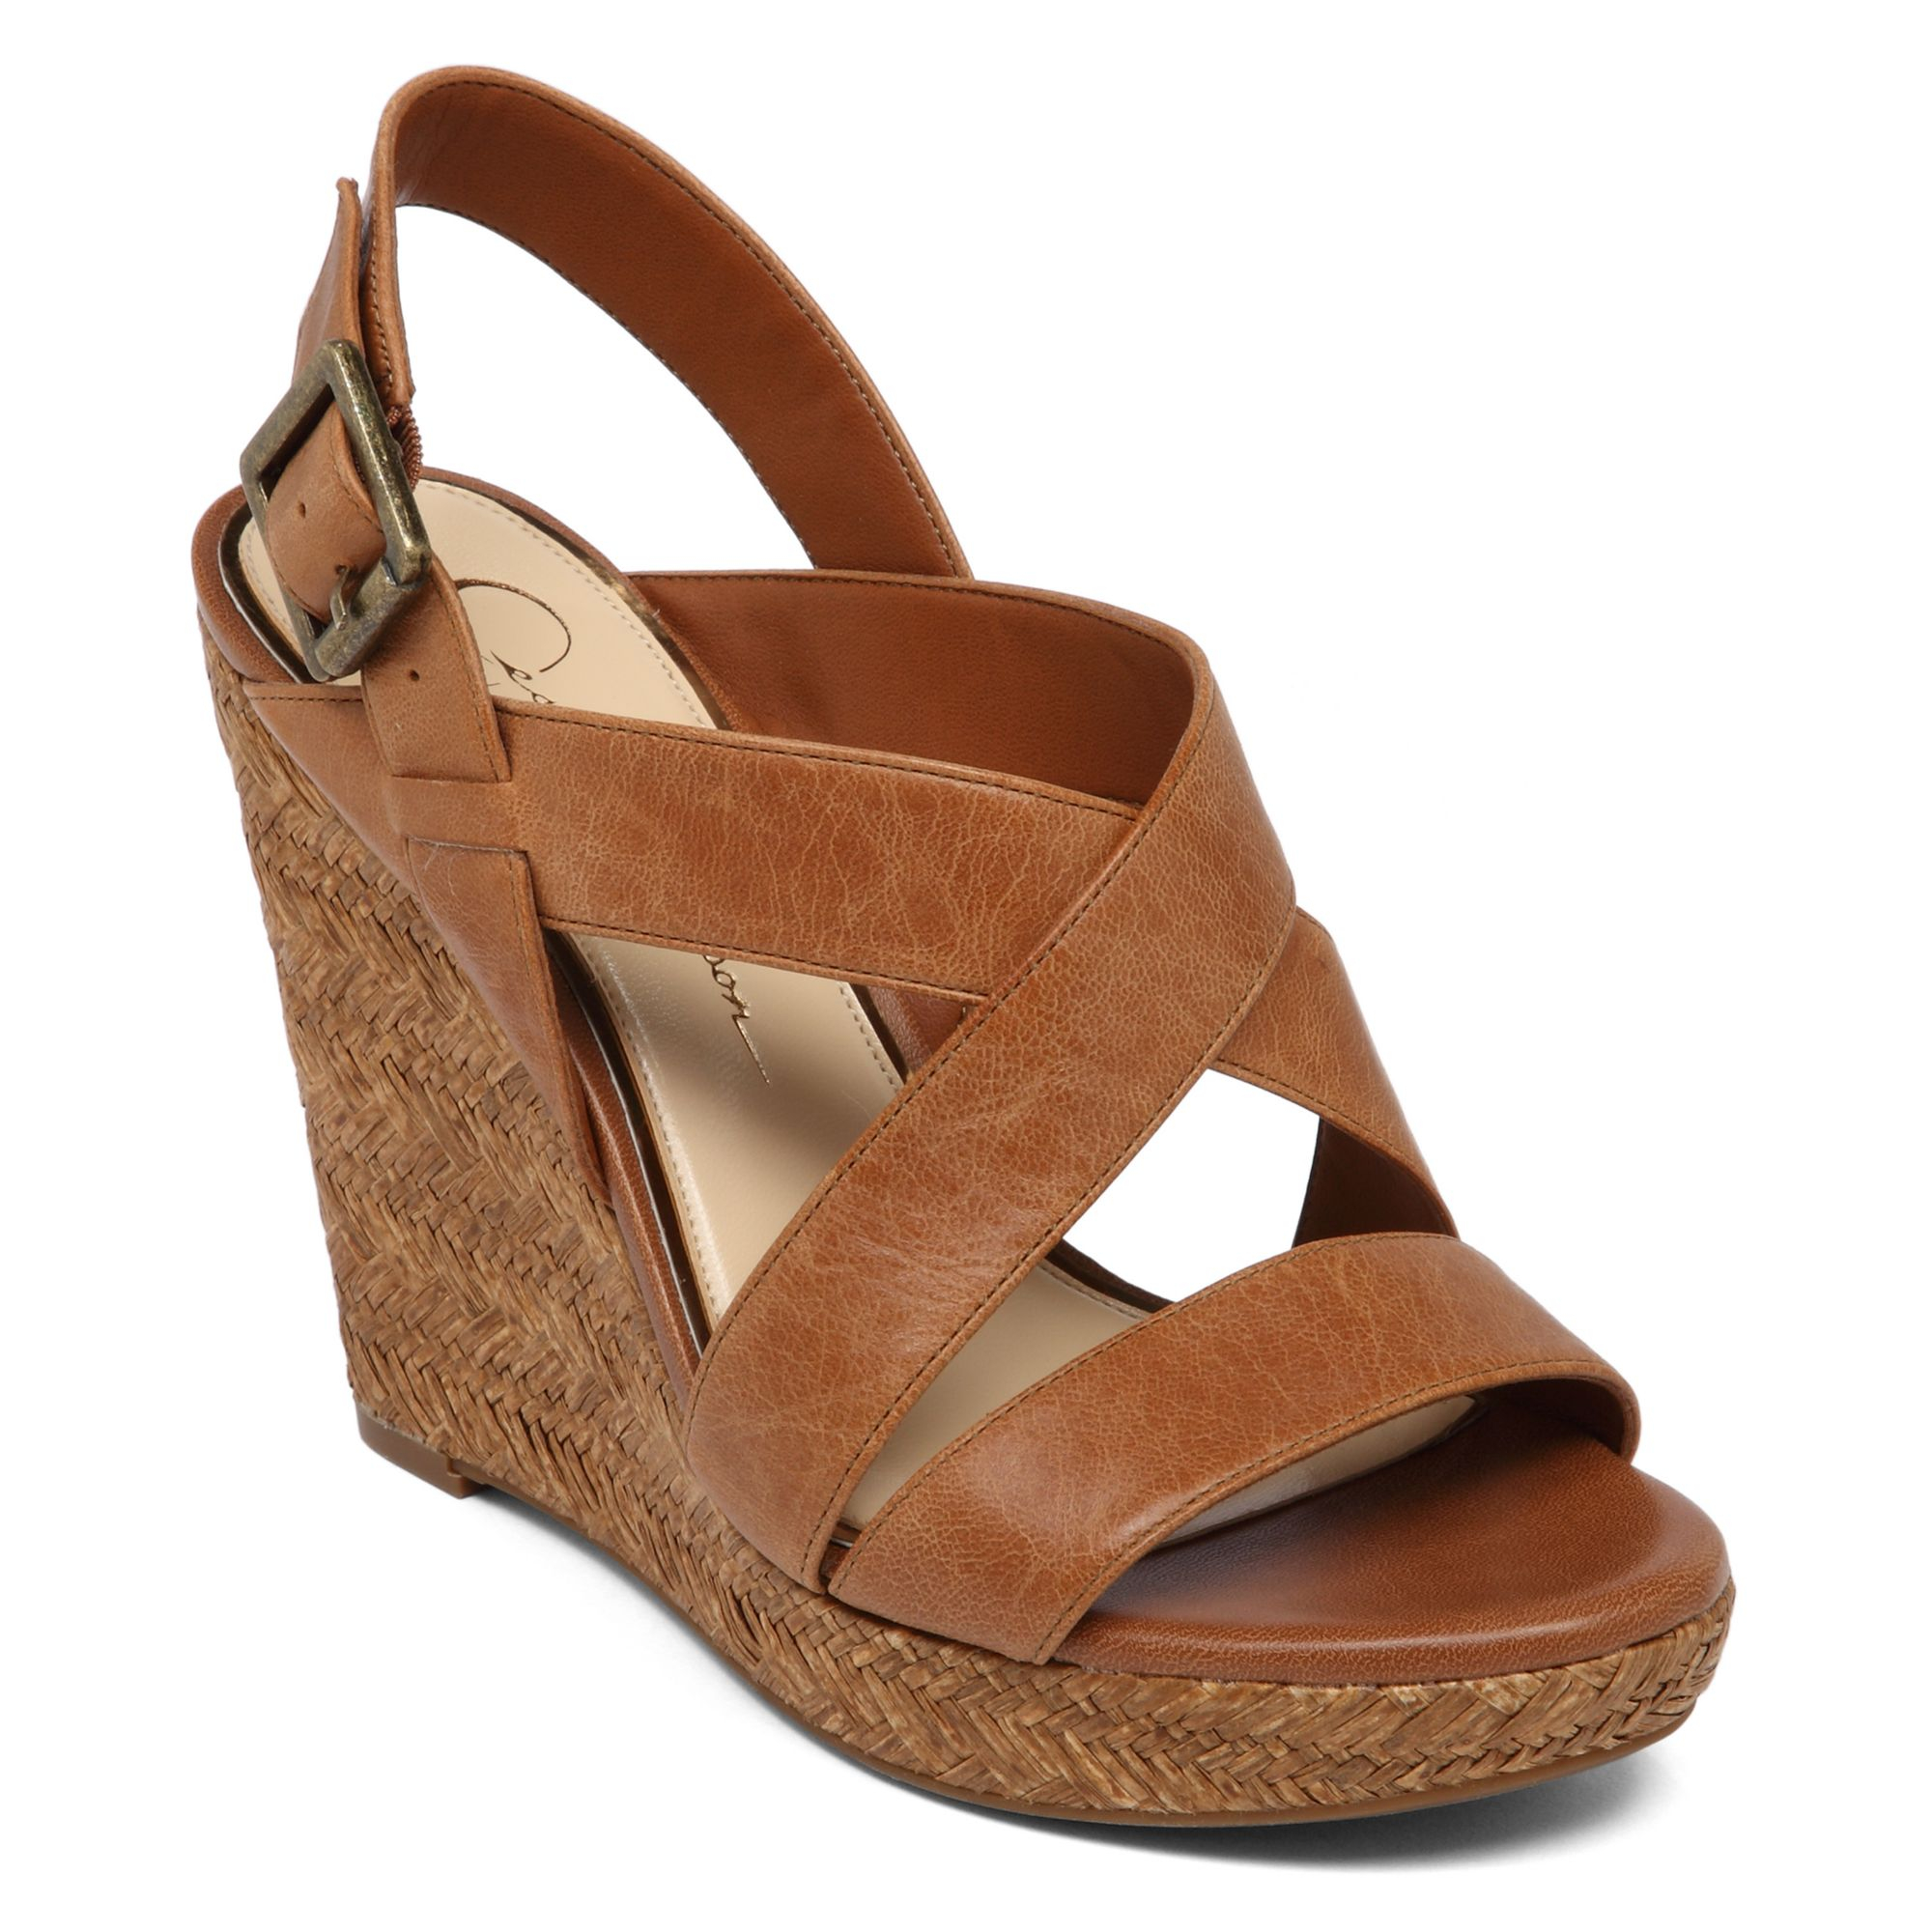 603146ef7a38 Lyst jessica simpson jerrimo platform wedge sandals in brown jpg 2000x2000 Jessica  simpson tan wedges